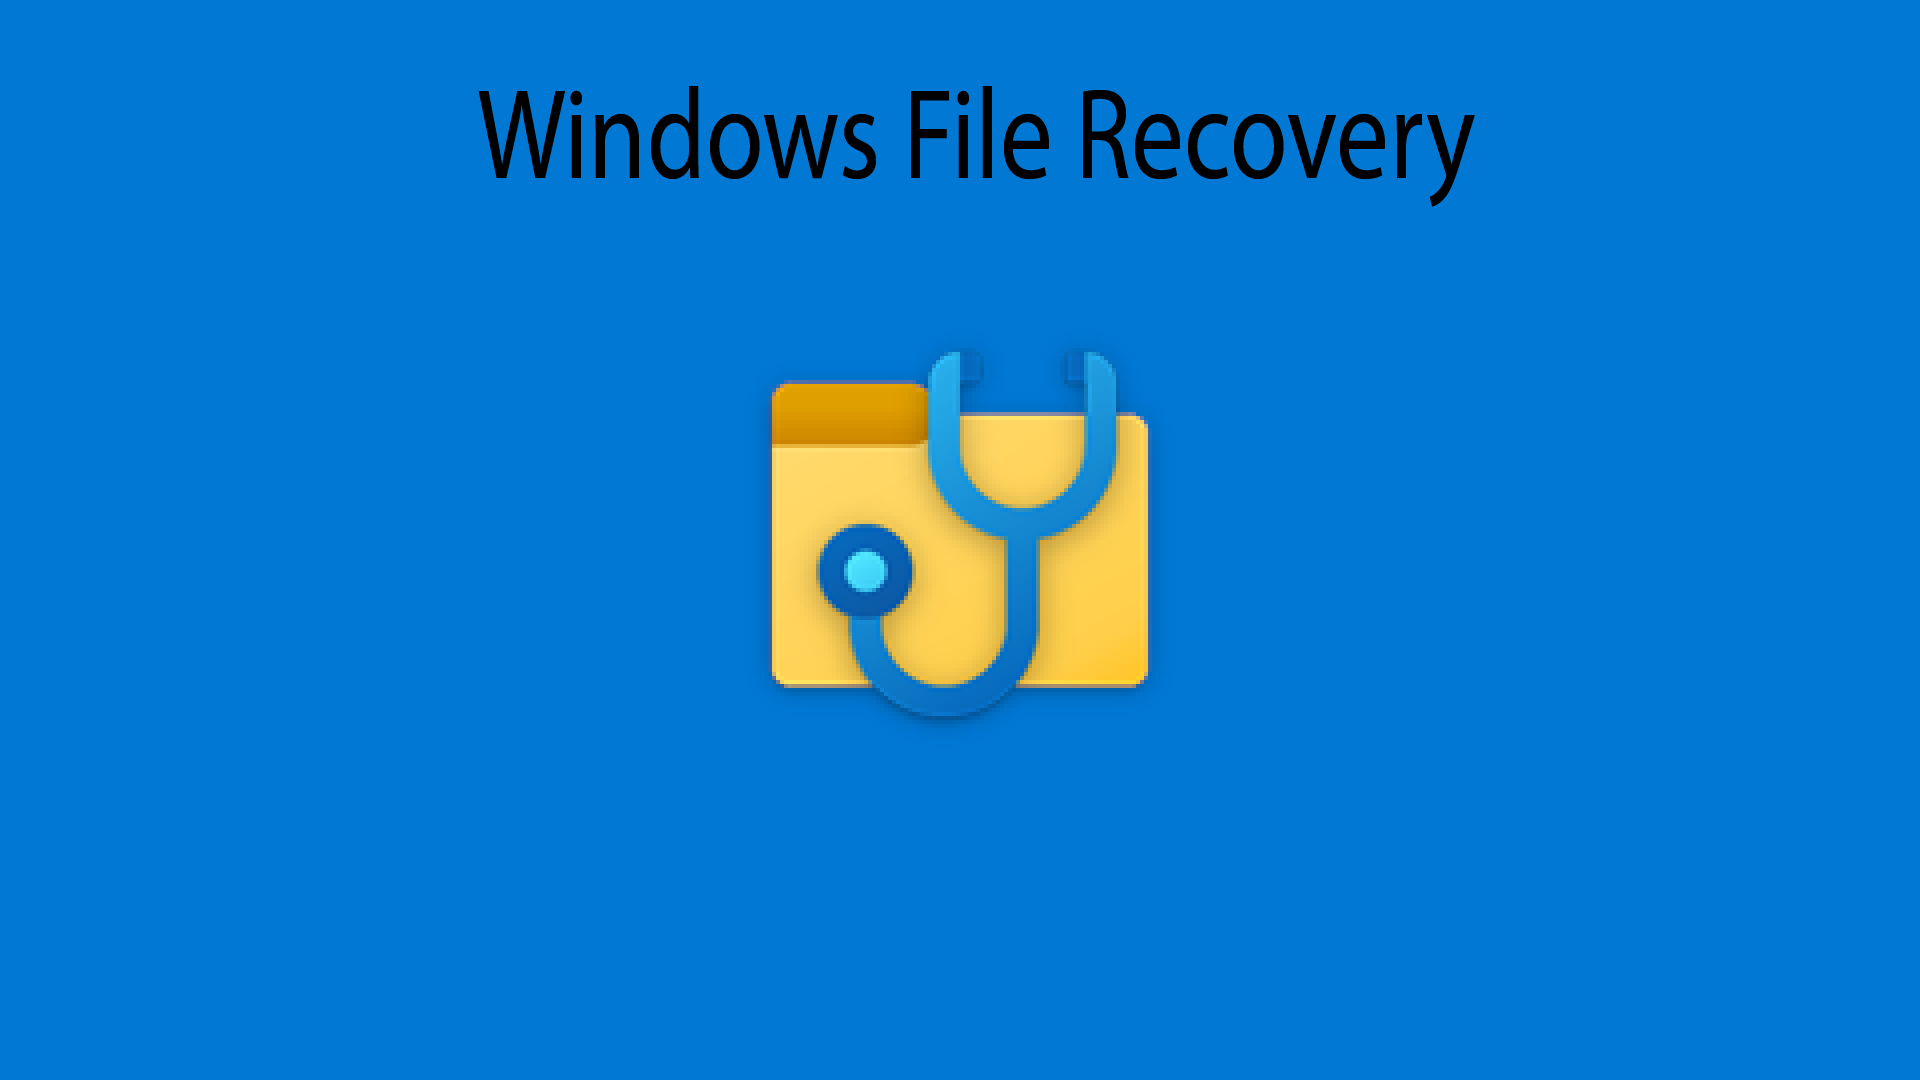 Microsoft Windows File Recovery